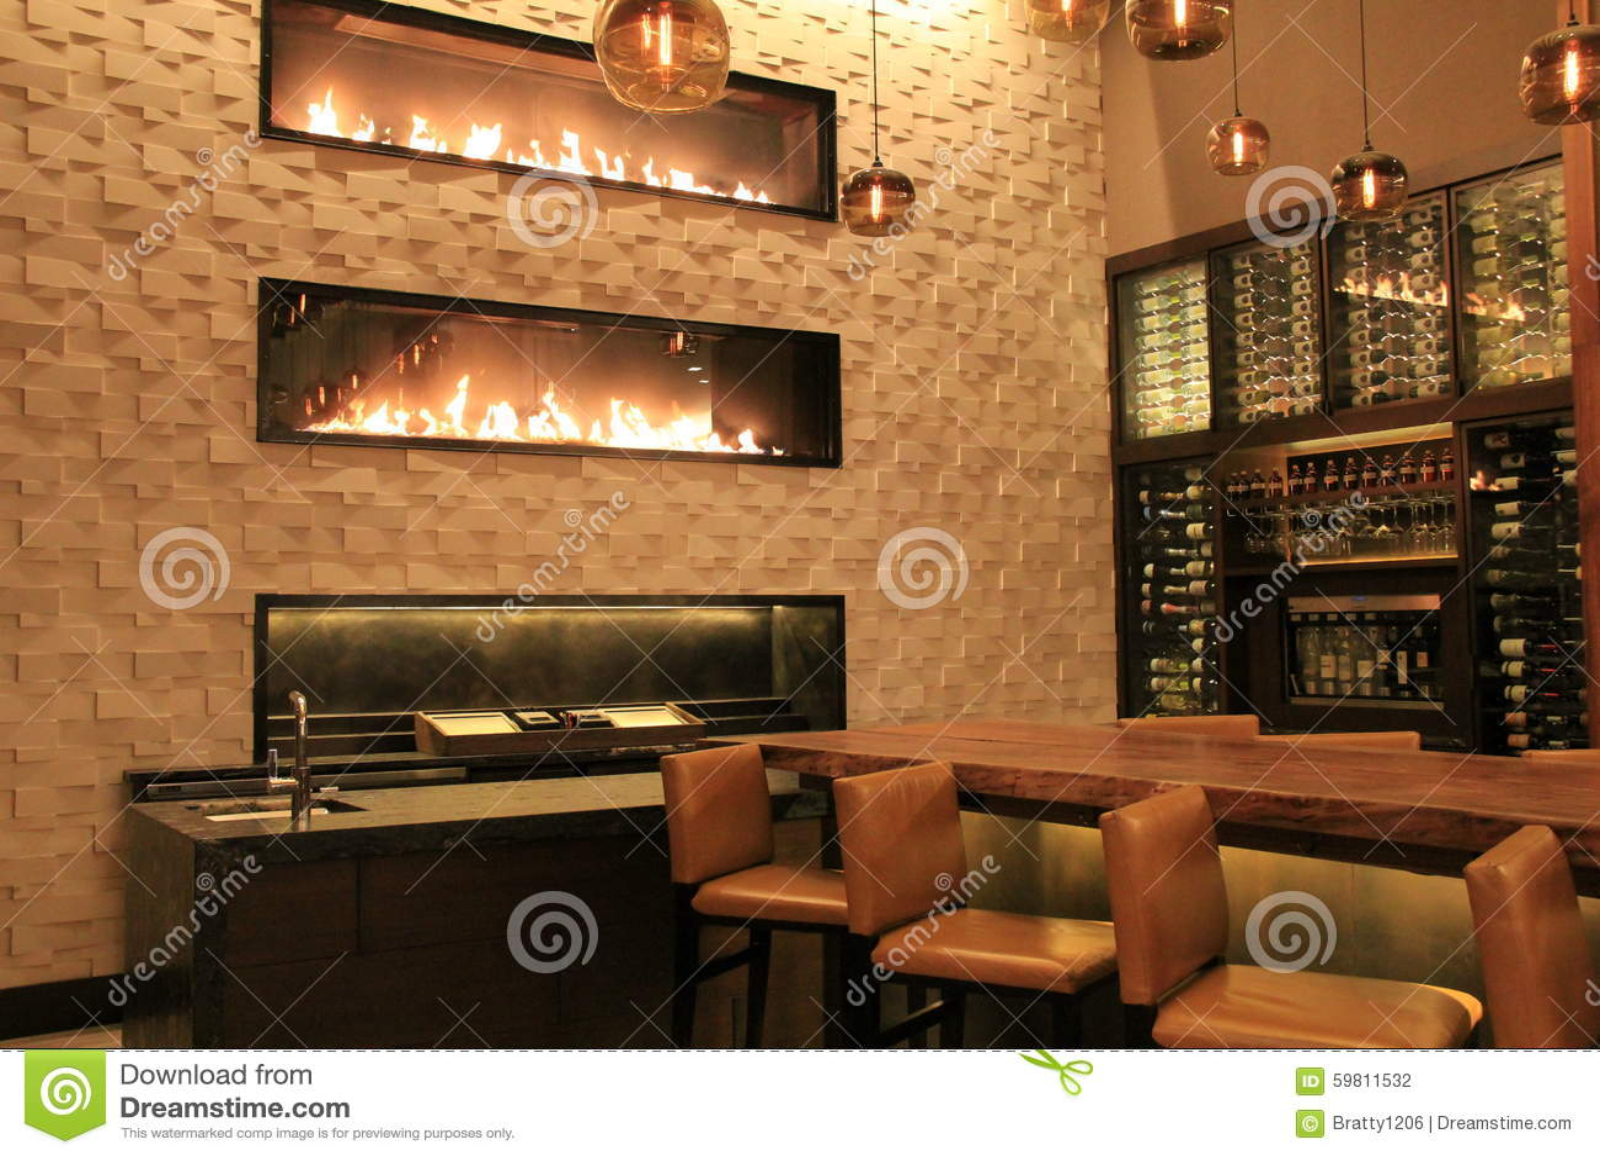 Cena bonita da barra, com morno, convidando, chaminés, hotel de Grand Hyatt, Denver, Colorado, 2015